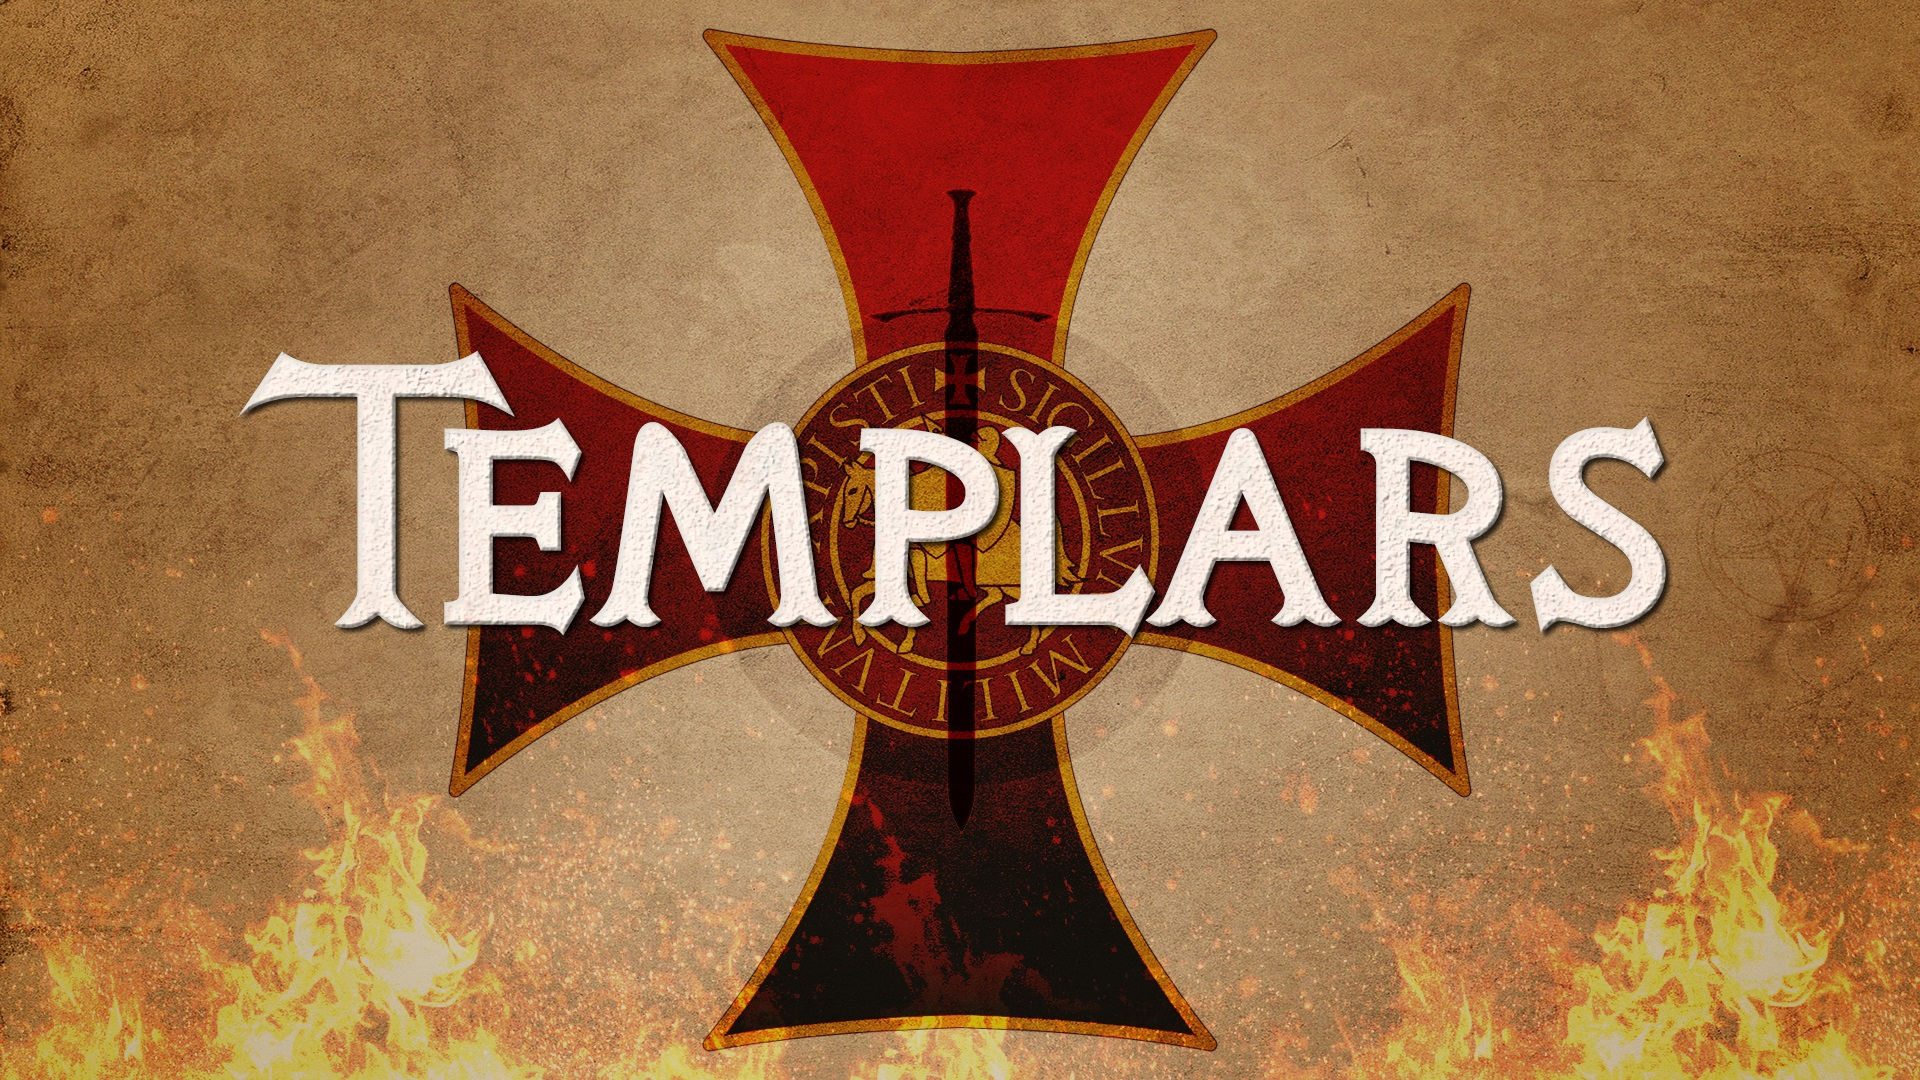 Templars1.jpg